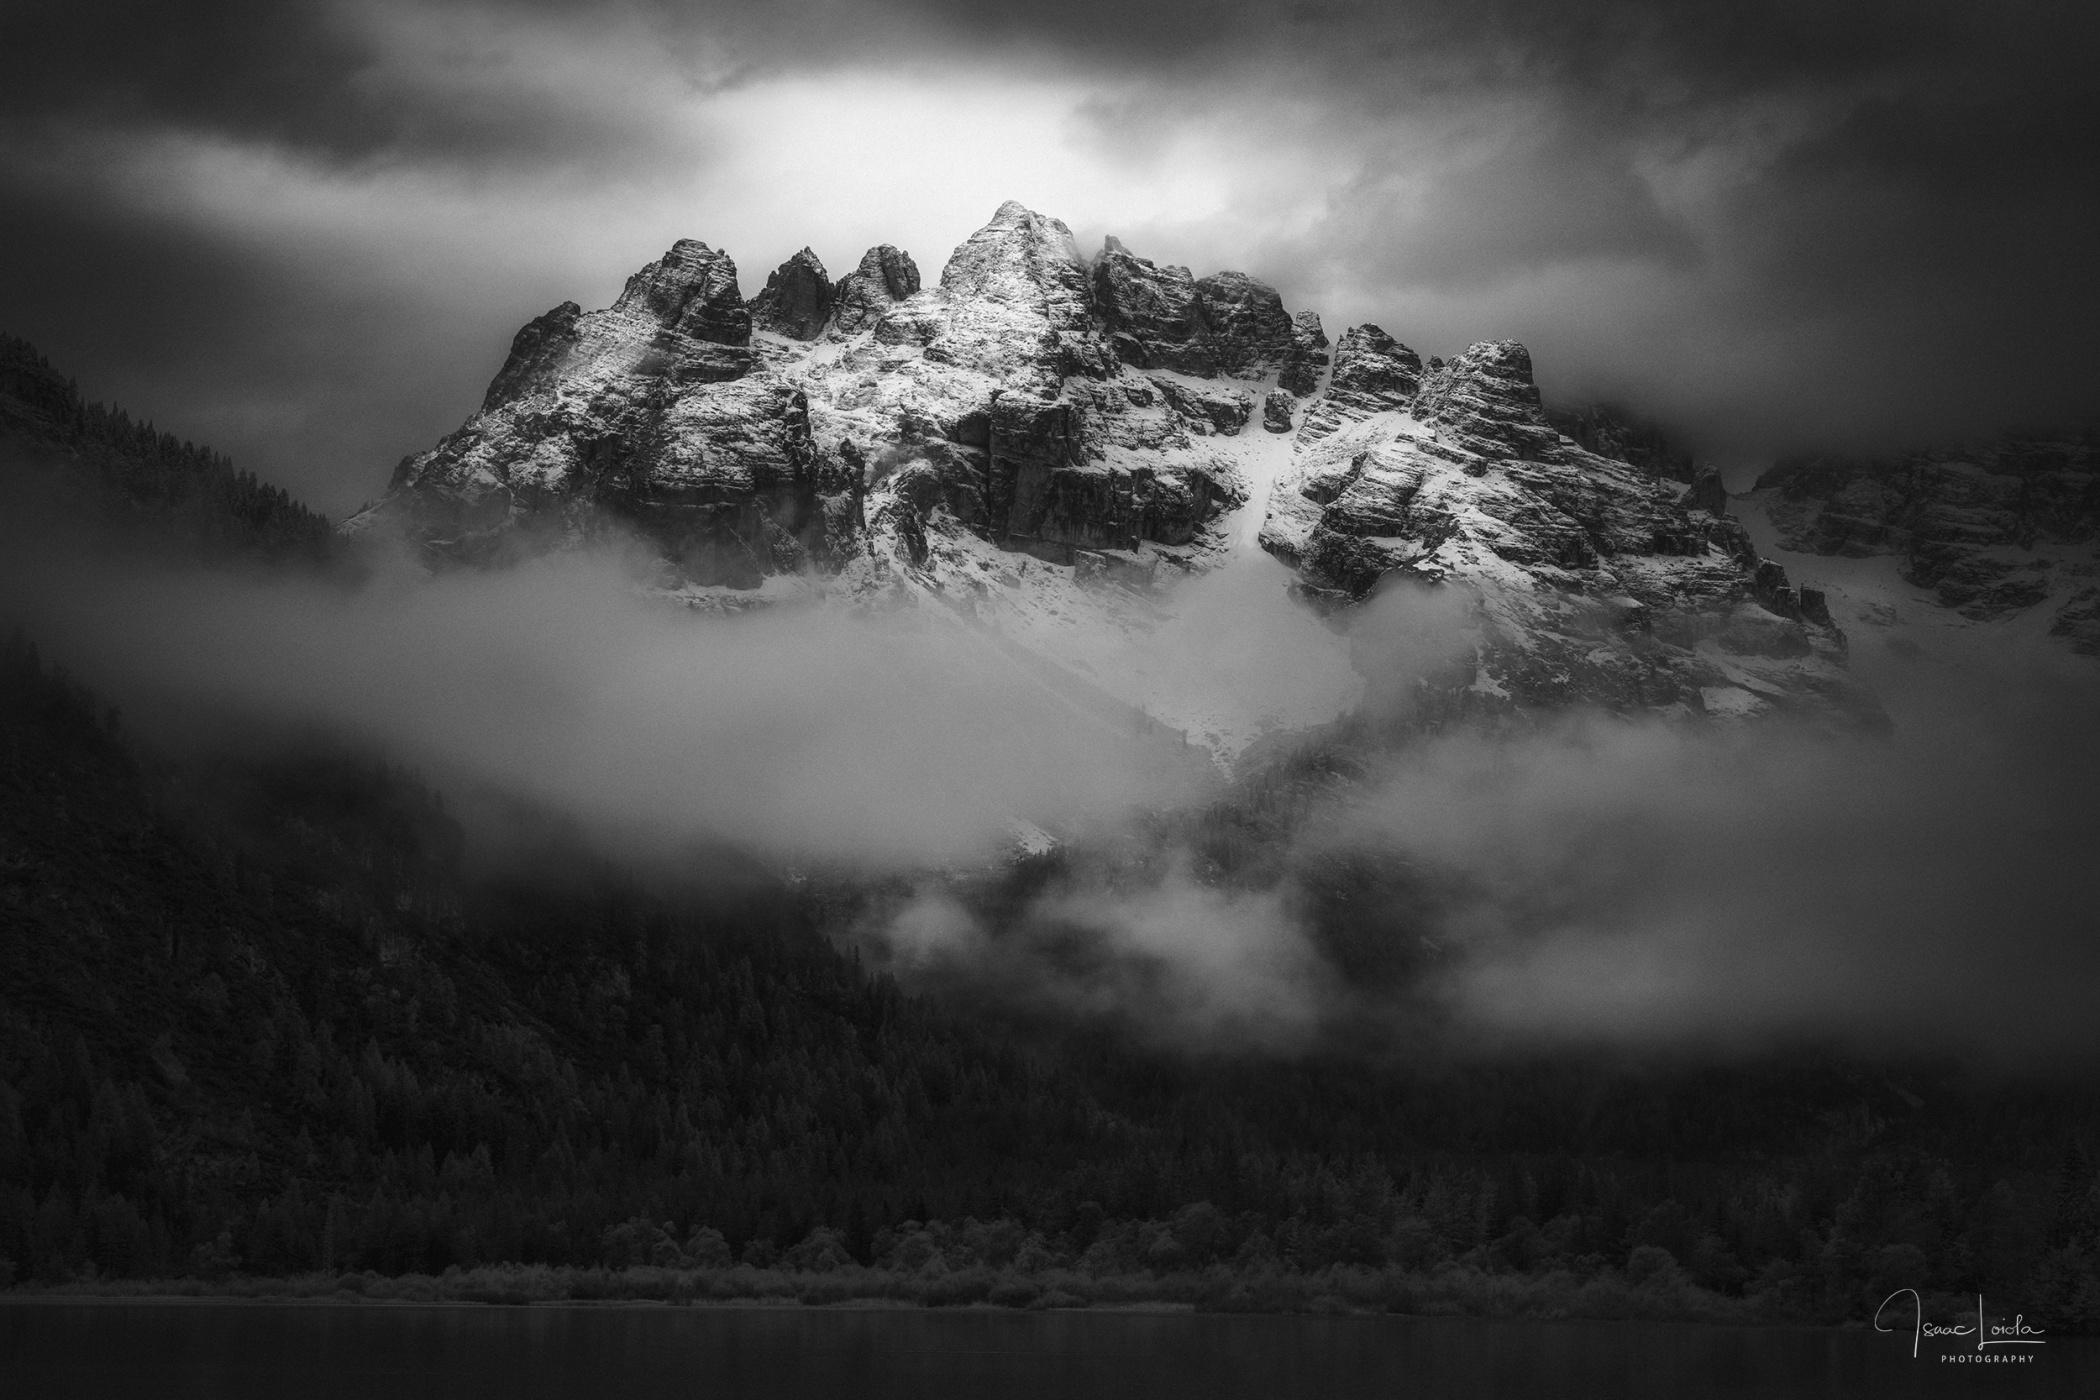 Lago di Landro - Monochromo - Isaac Loiola, Photography